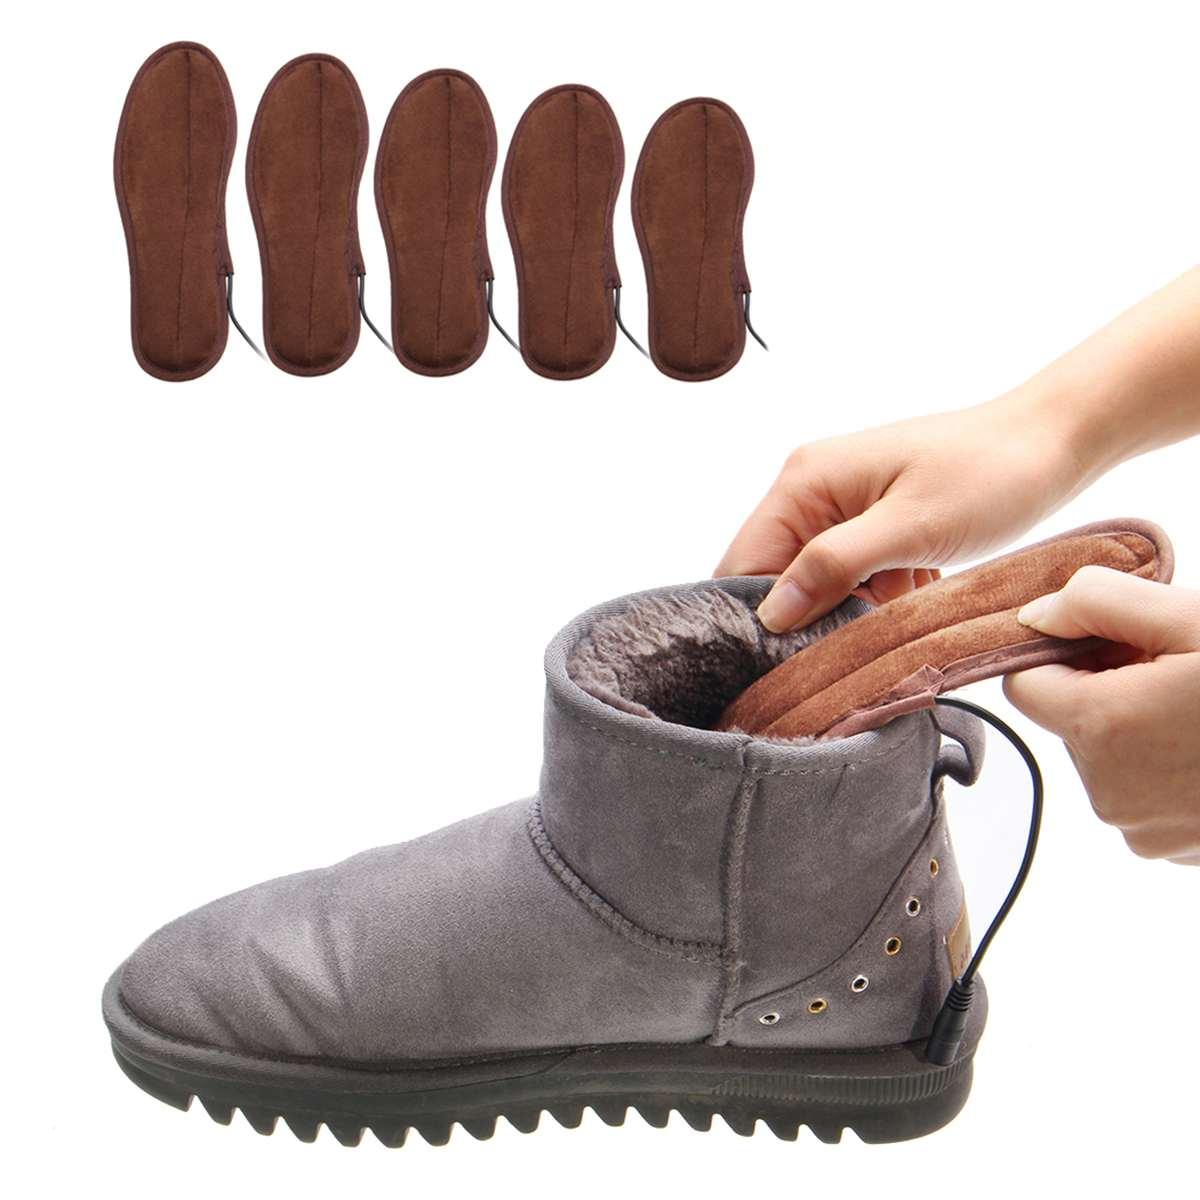 USB Electric Heated Insoles Soles Foot Warmer Heat Boots Shoes Pad Winter  Soft Fleece Heating Pad for Men Women-in Electric Heating Pads from Home    Garden ... 018daec4c4d3